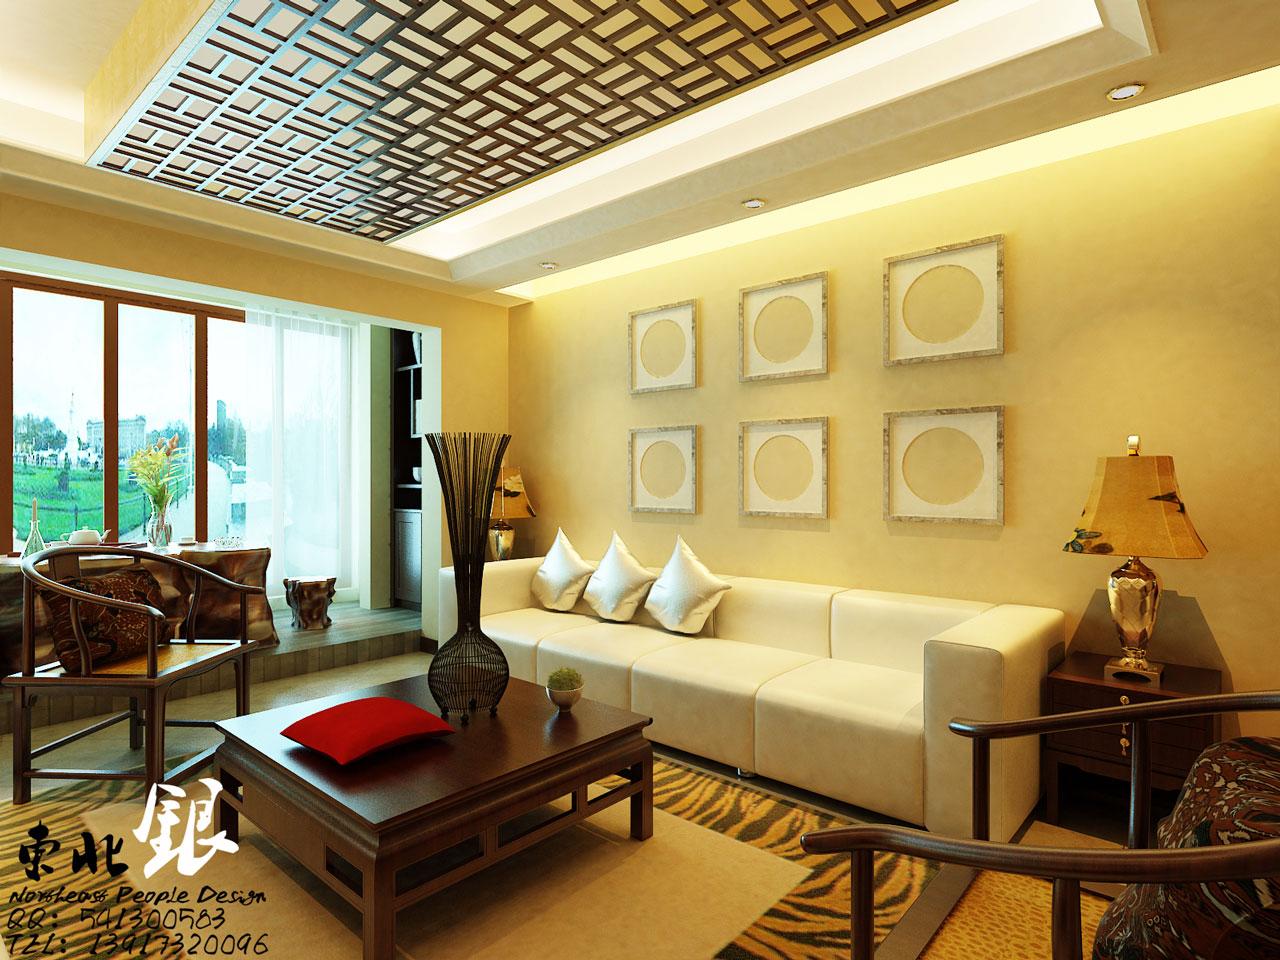 Source URL httpwwwpicstopincom369modern asian art oil painting 1280x960